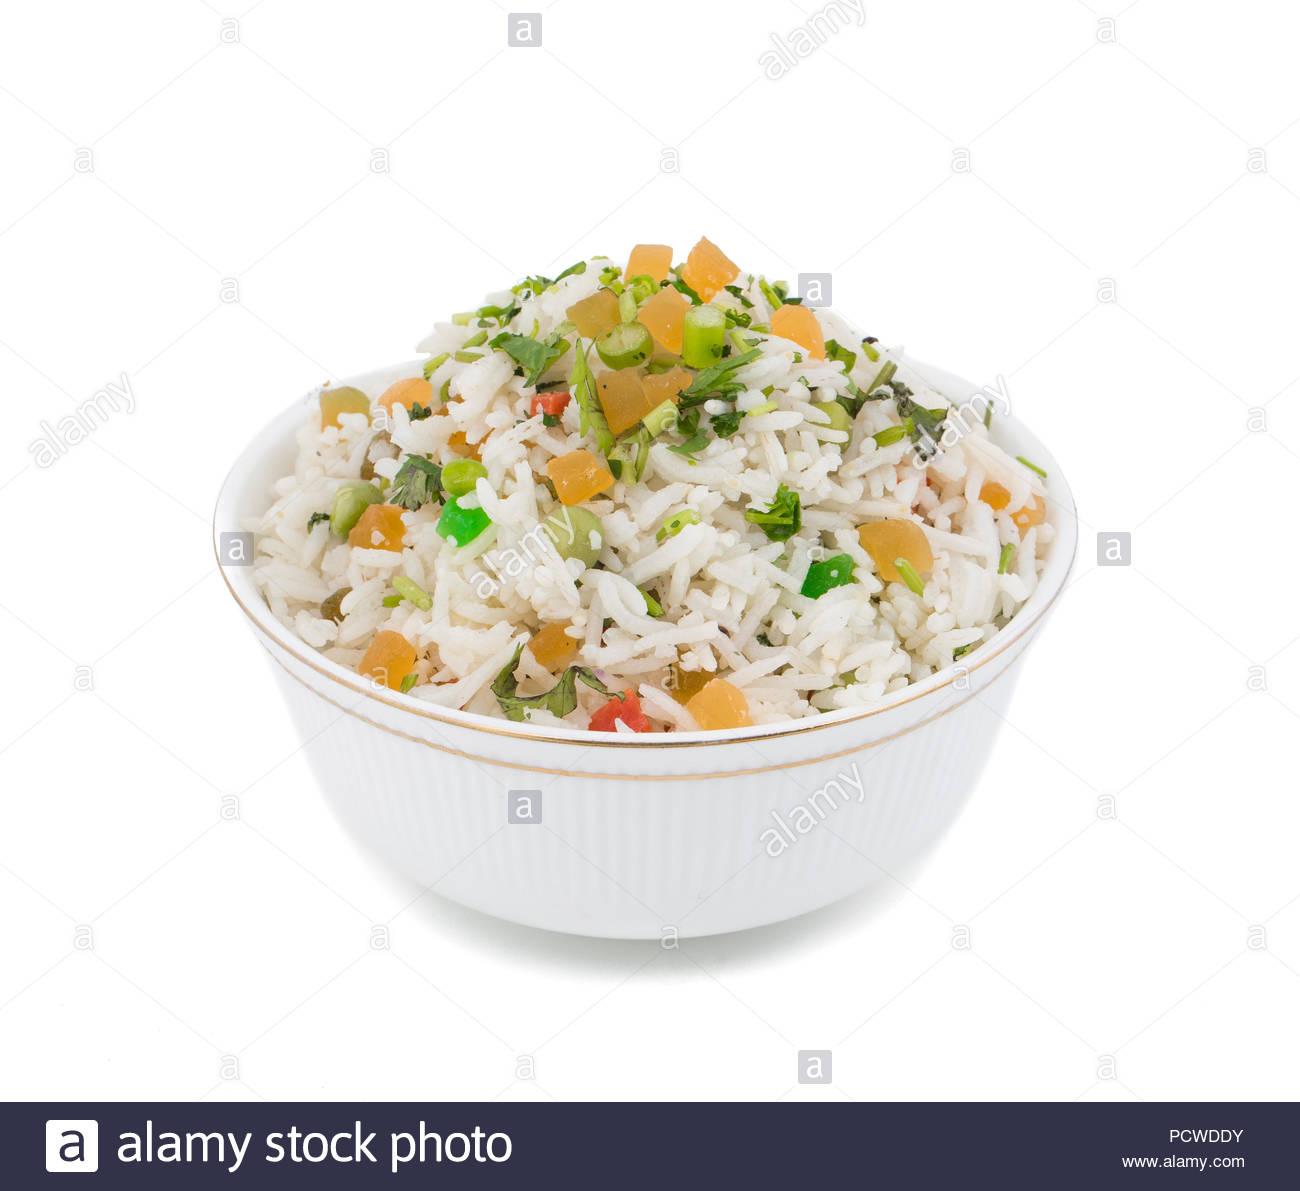 fresh and healthy Veg biryani or kashmiri pulav served in bowl - Stock Image